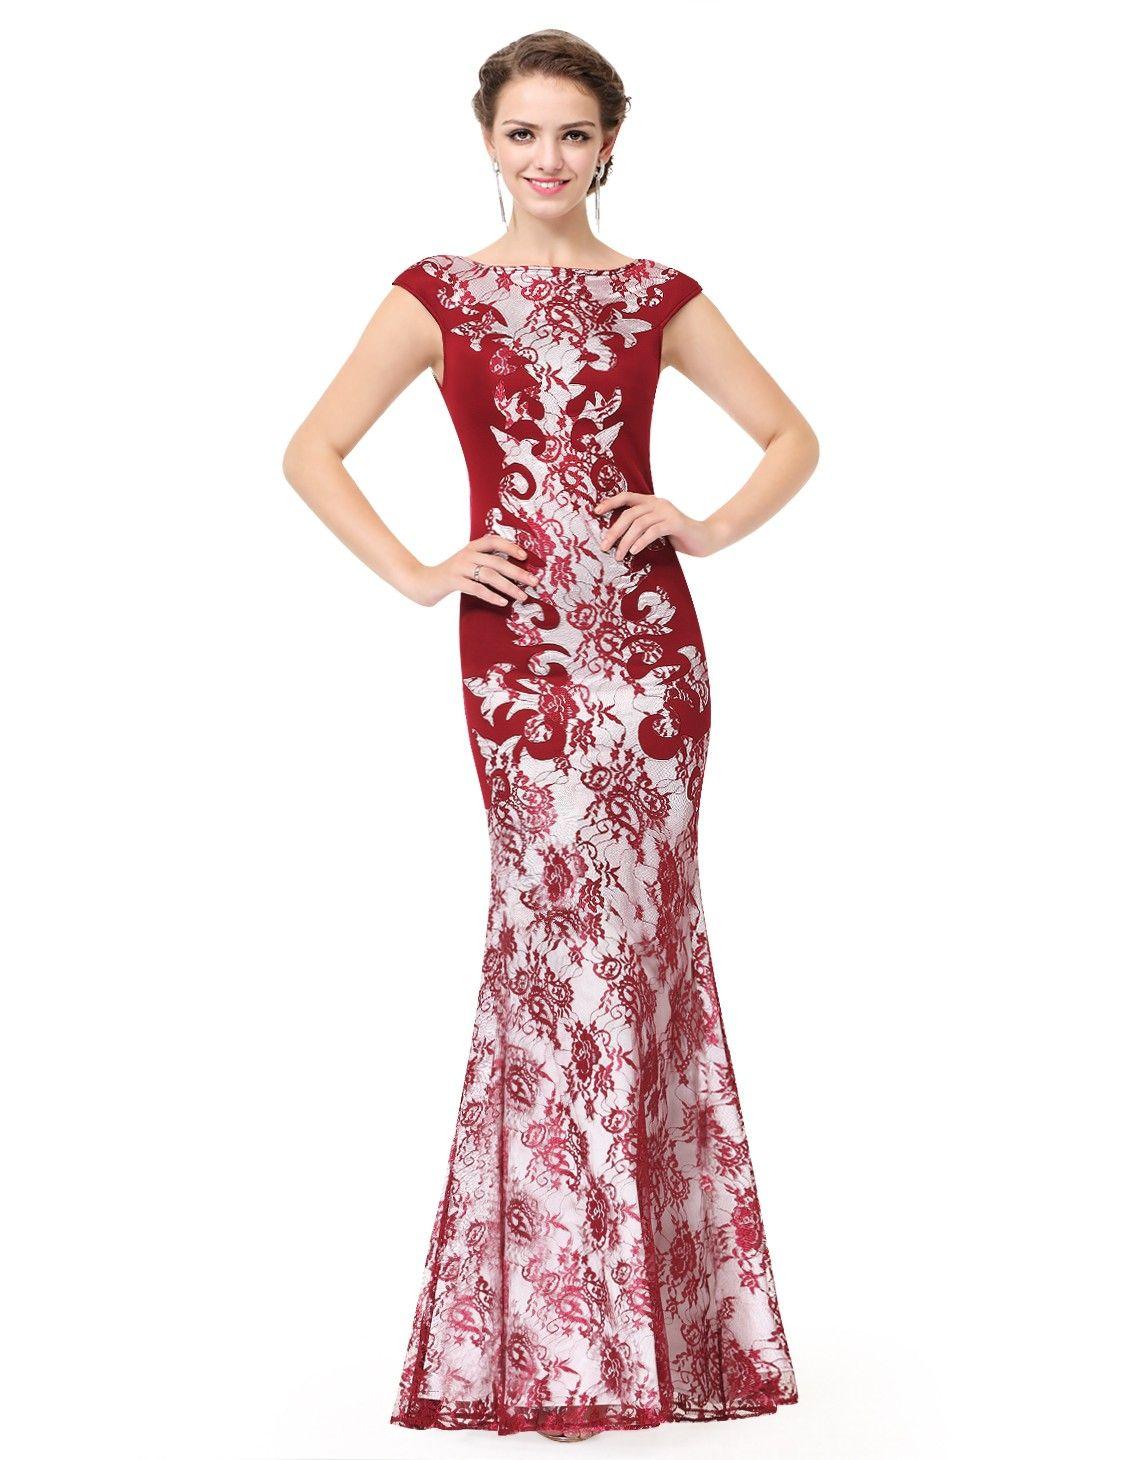 Elegantes Abenkleid in Rot mit Spitze | Lila abendkleid ...